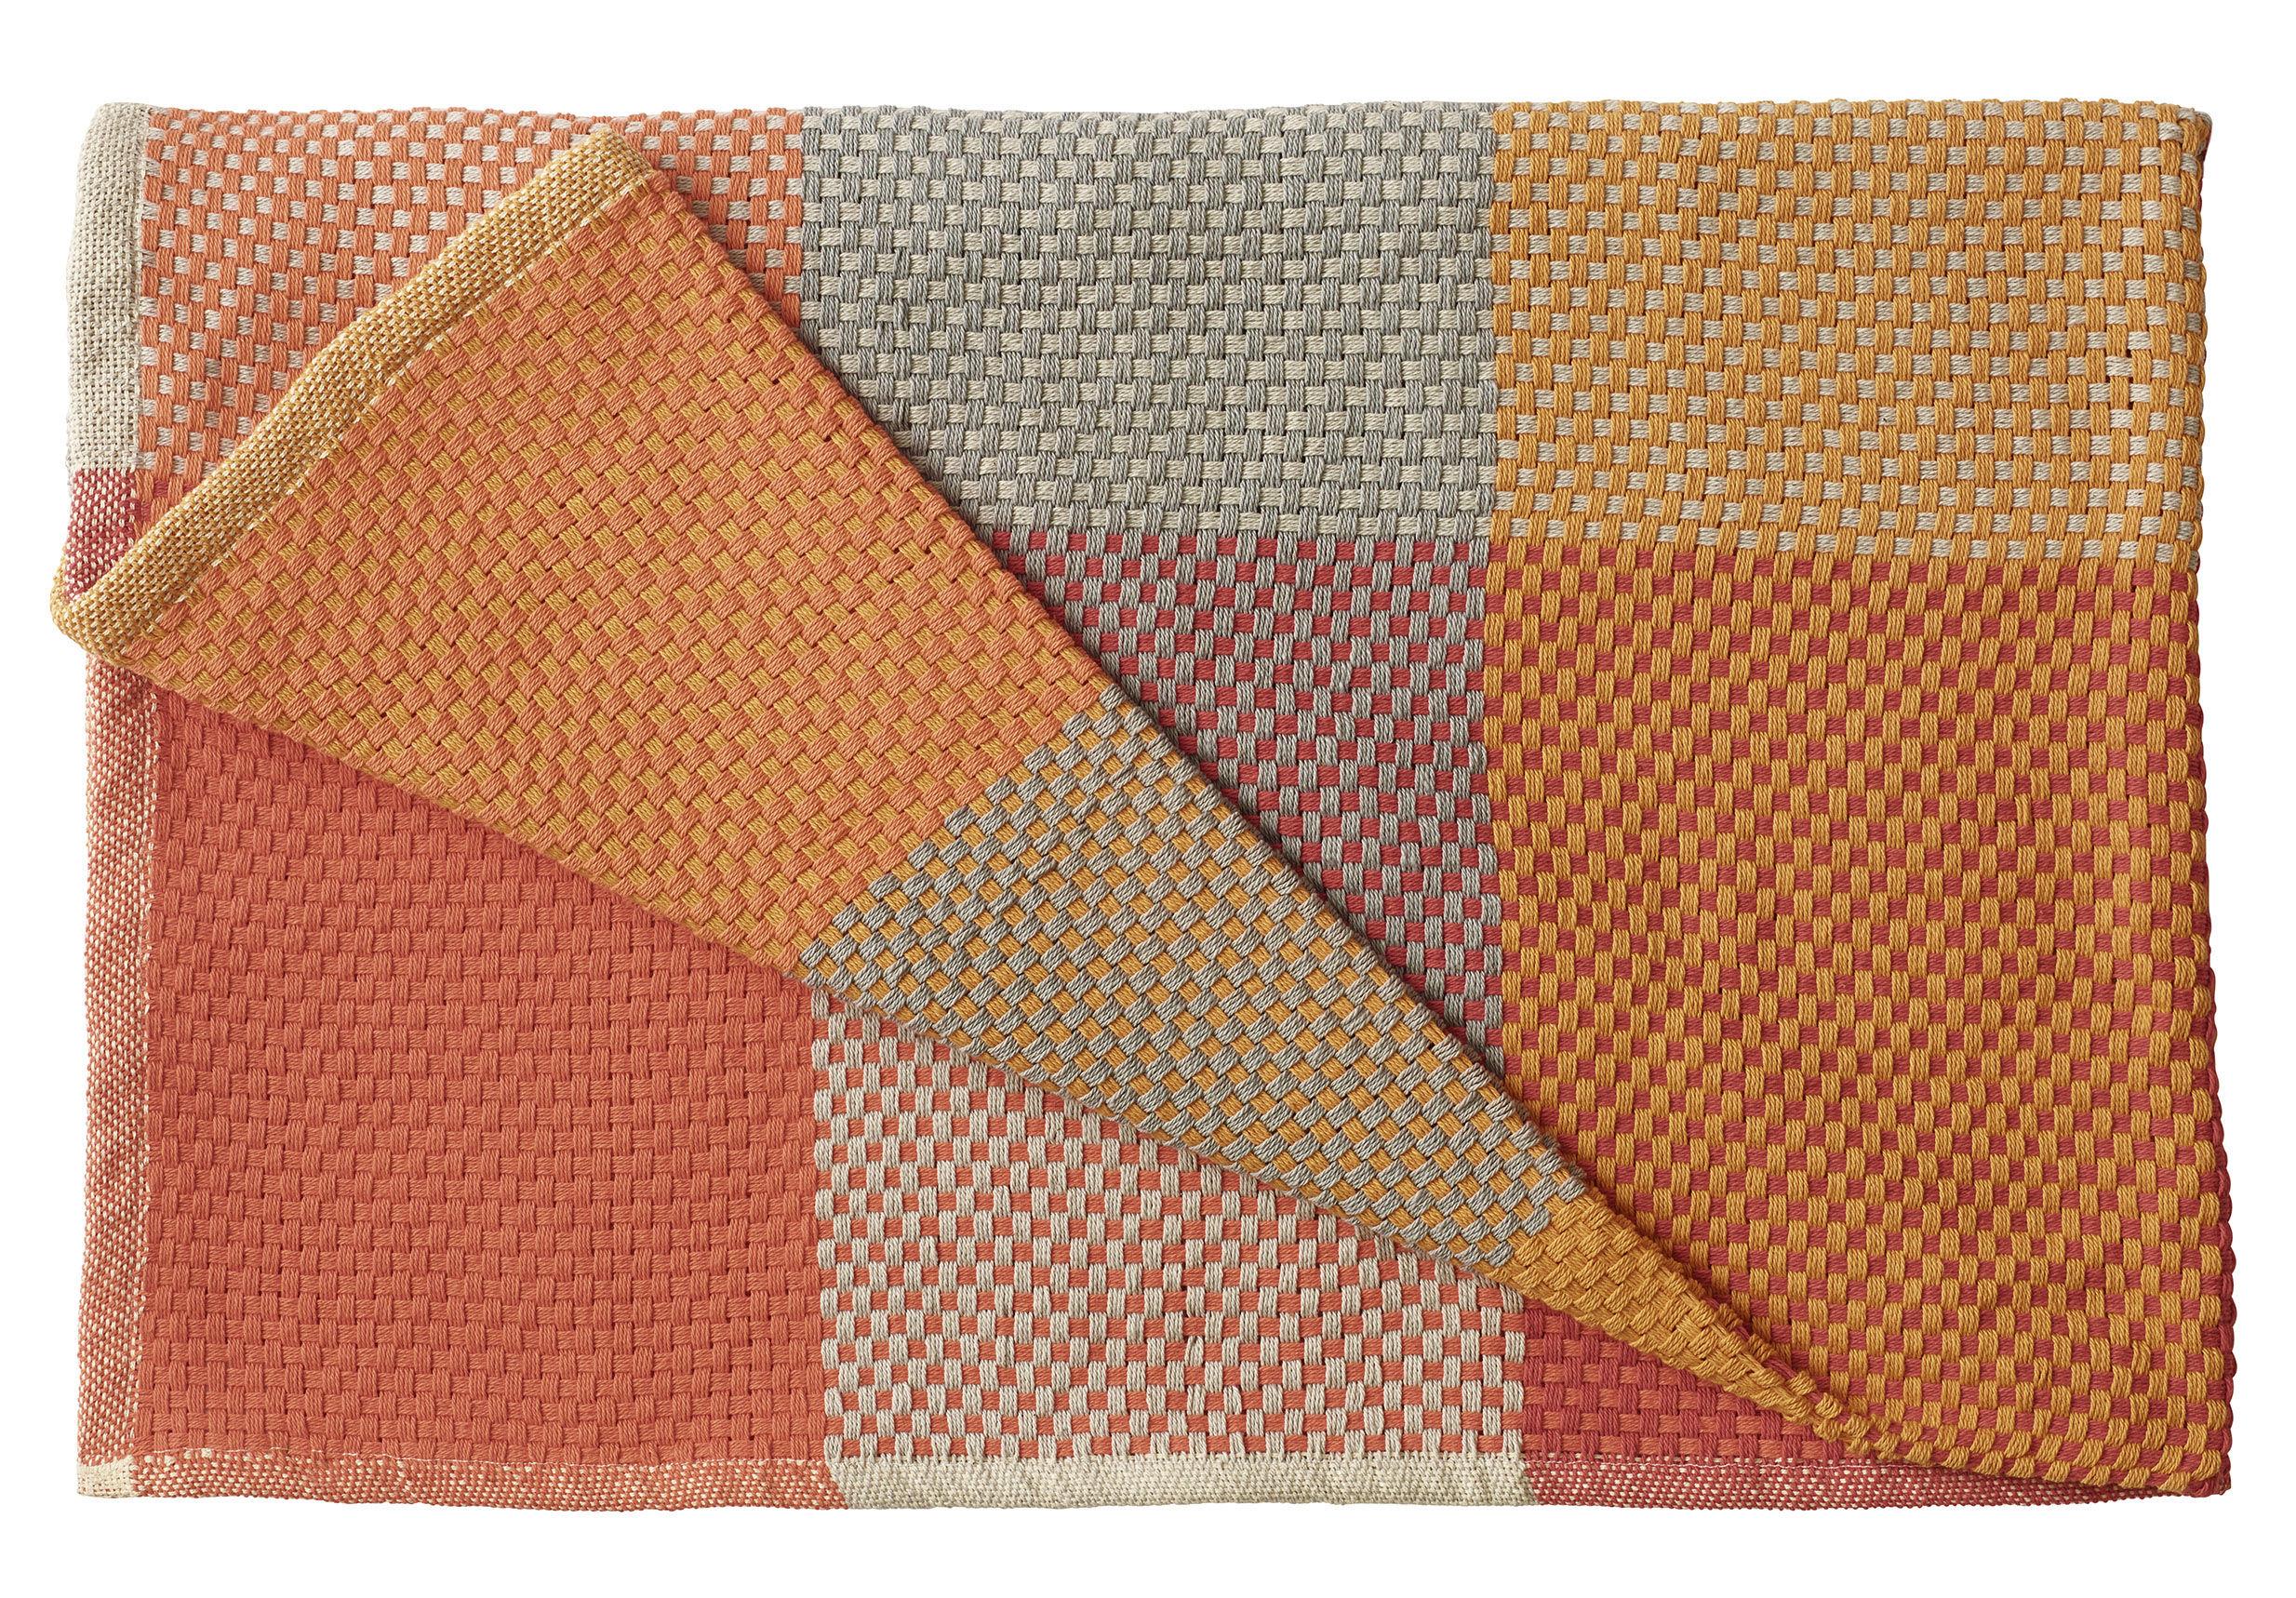 Decoration - Bedding & Bath Towels - Loom Plaid - /130 x 180 cm by Muuto - Tangerine - Cotton